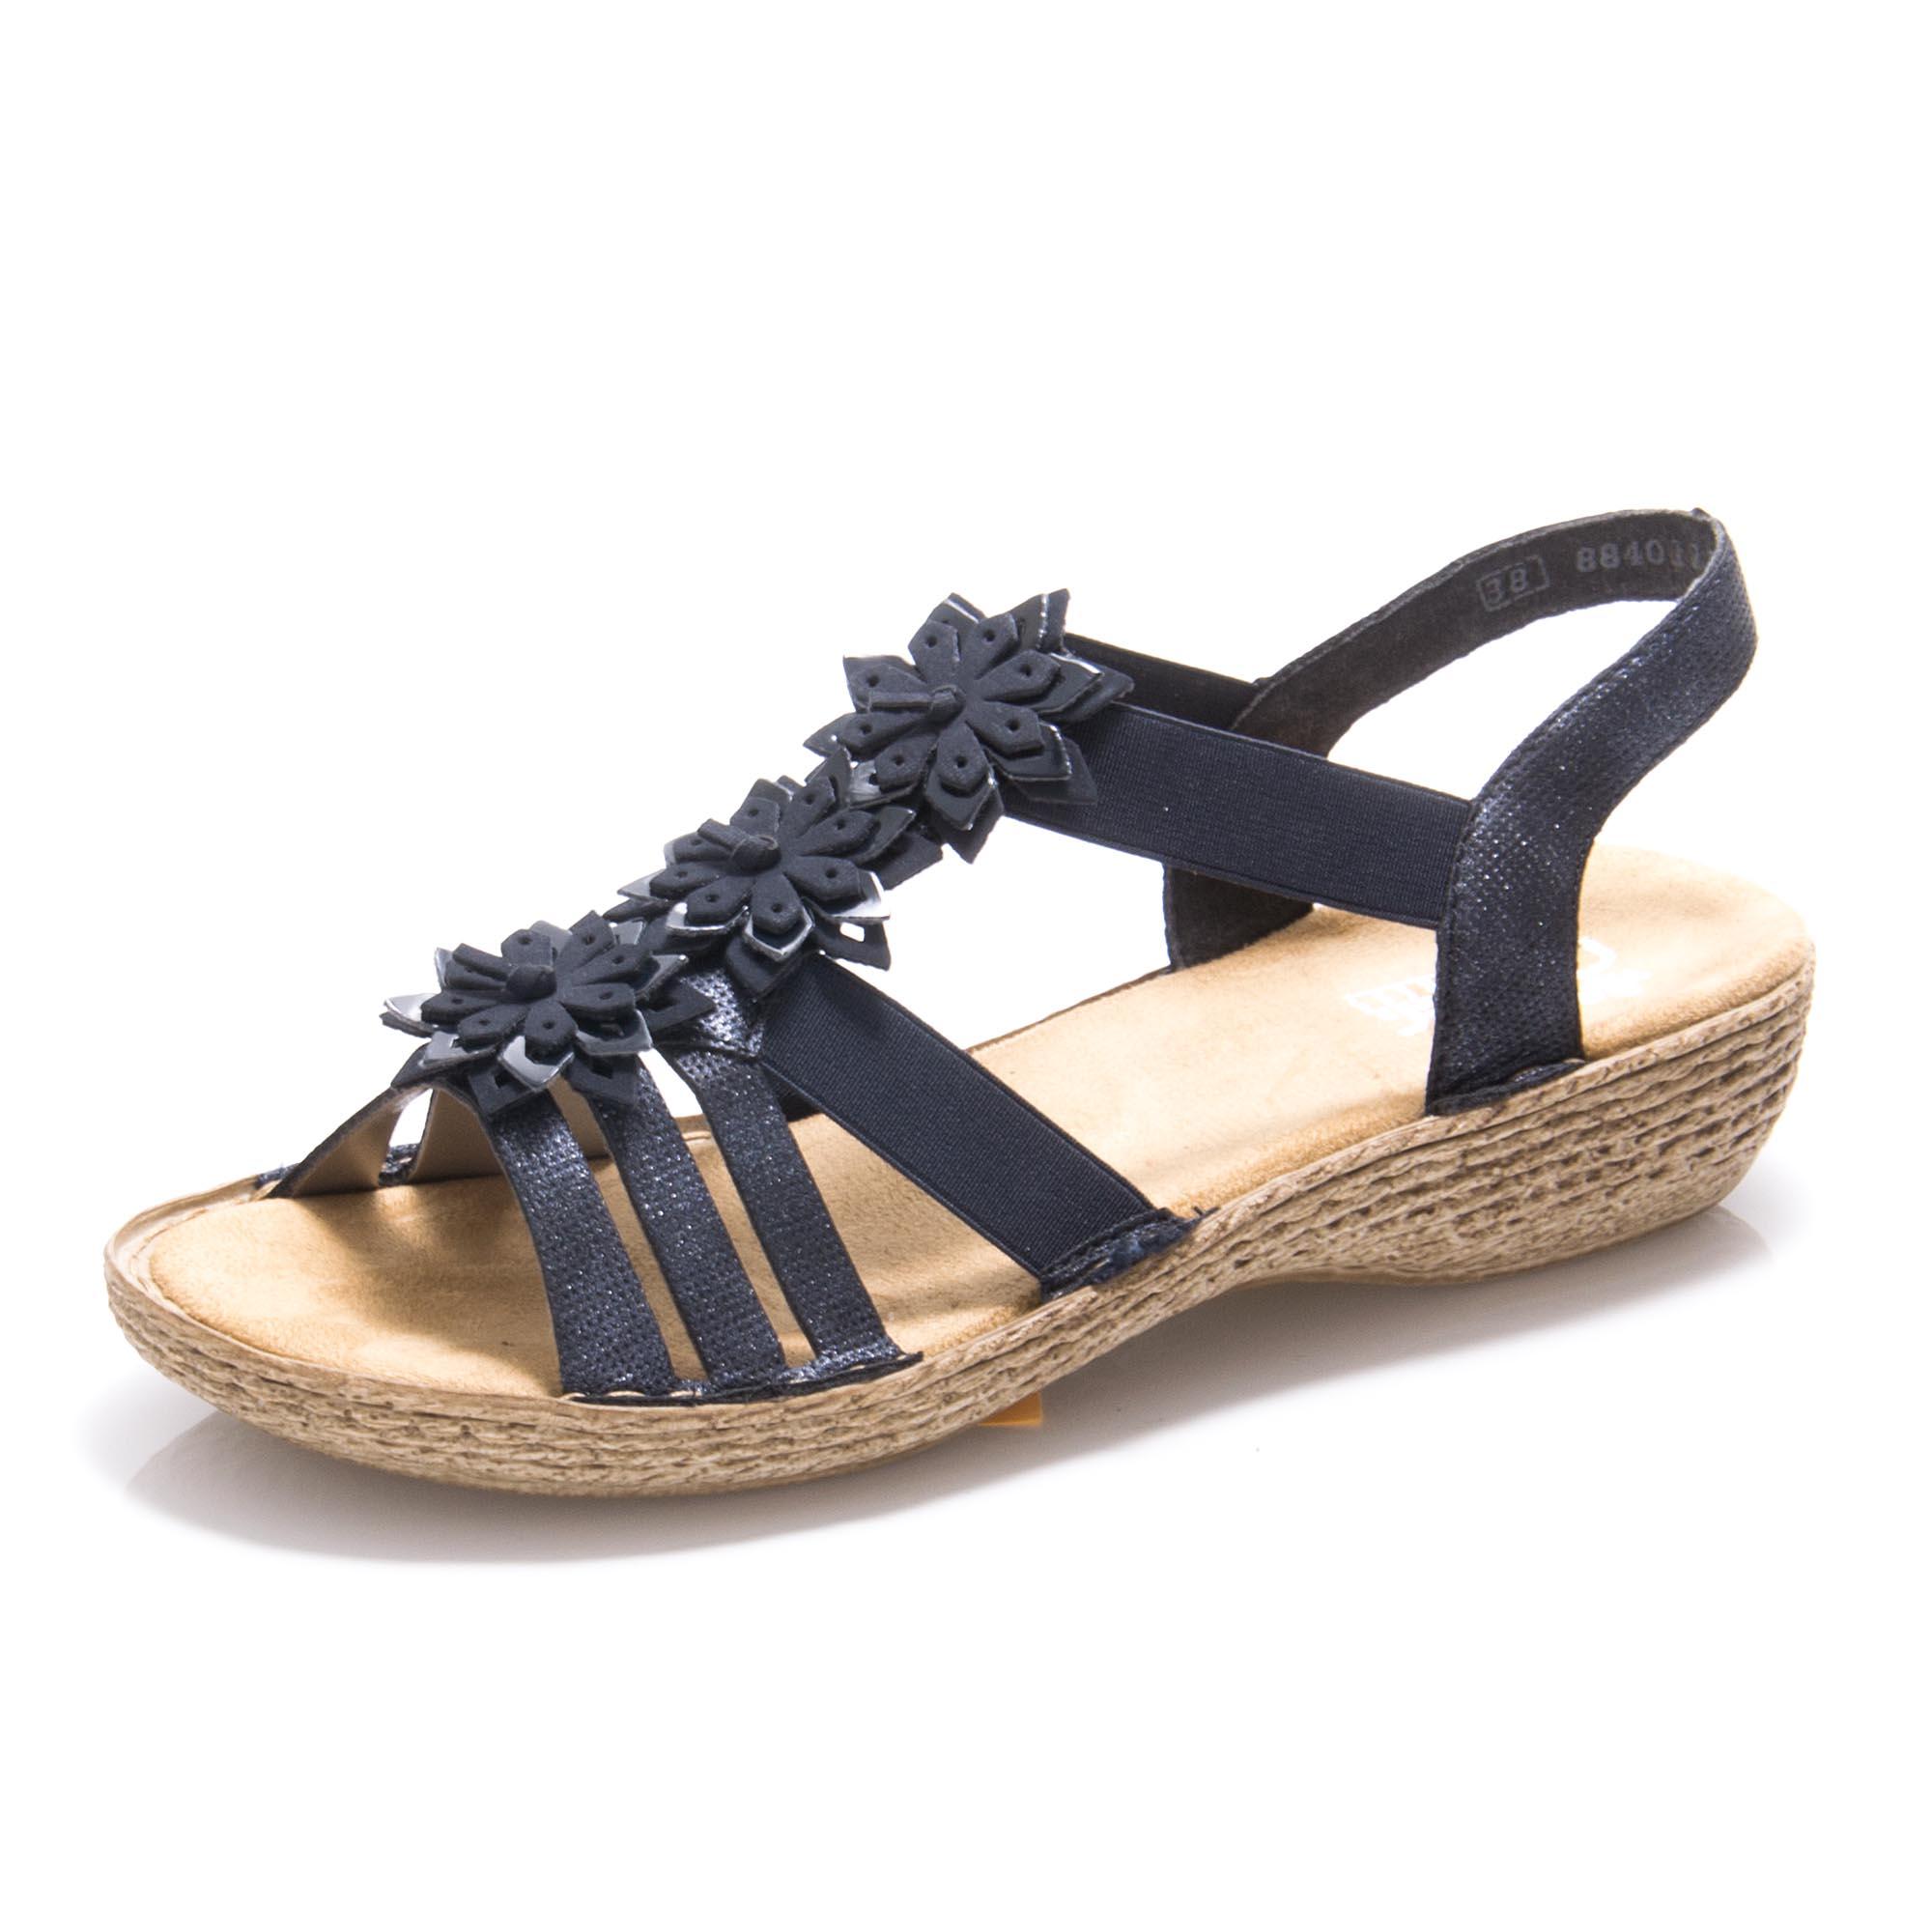 Dámská obuv RIEKER 65858-14 BLAU F S 9  e4874307b9